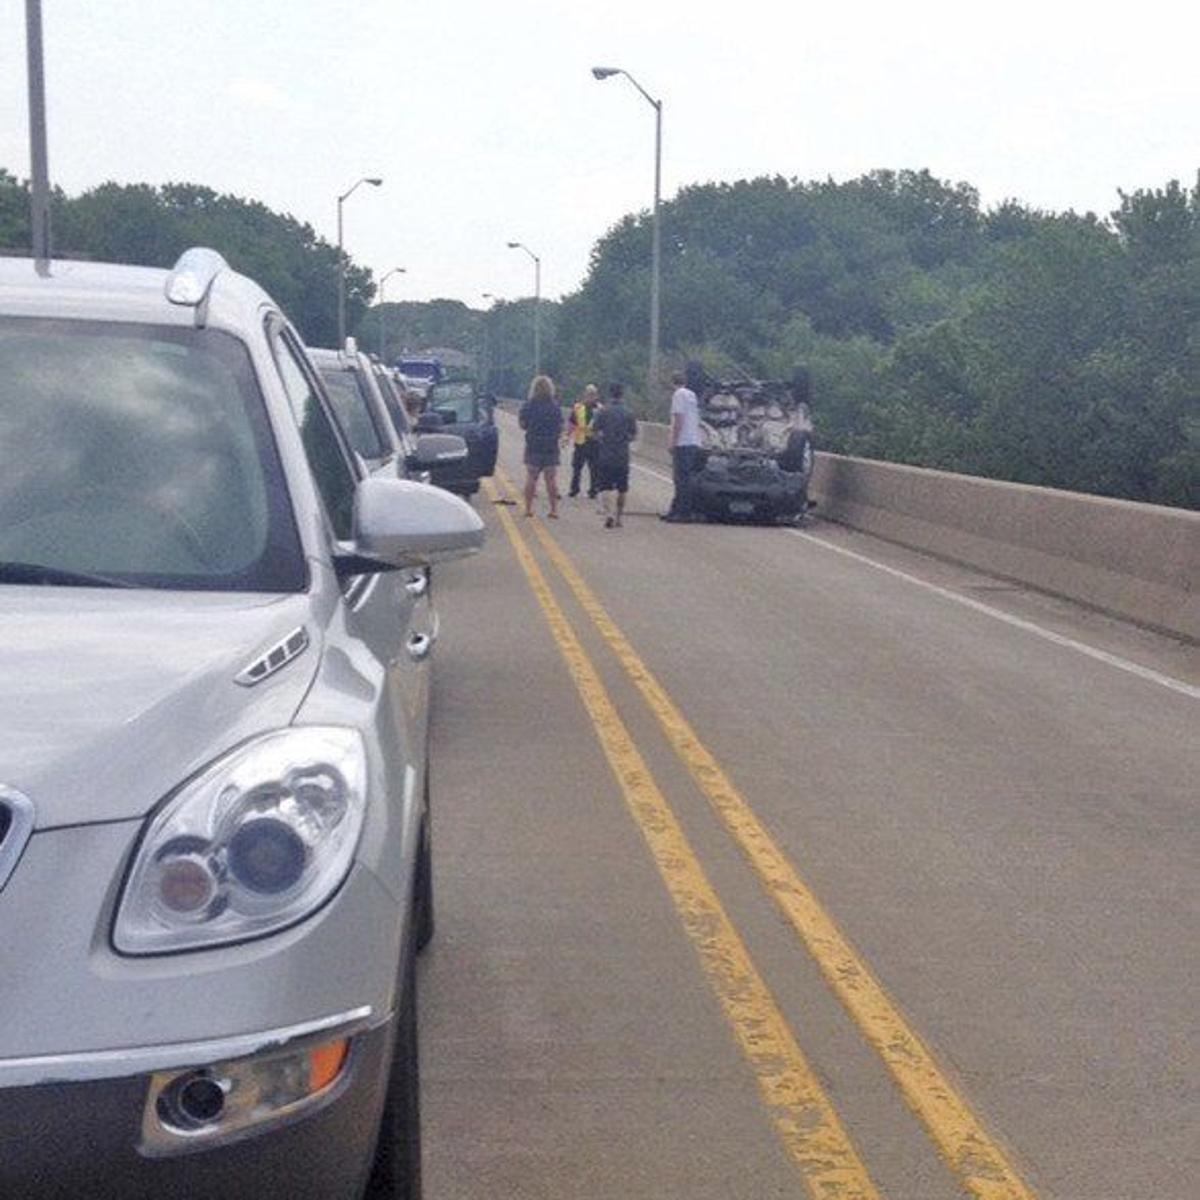 UPDATE: Vehicle flips on South Bridge | Local News